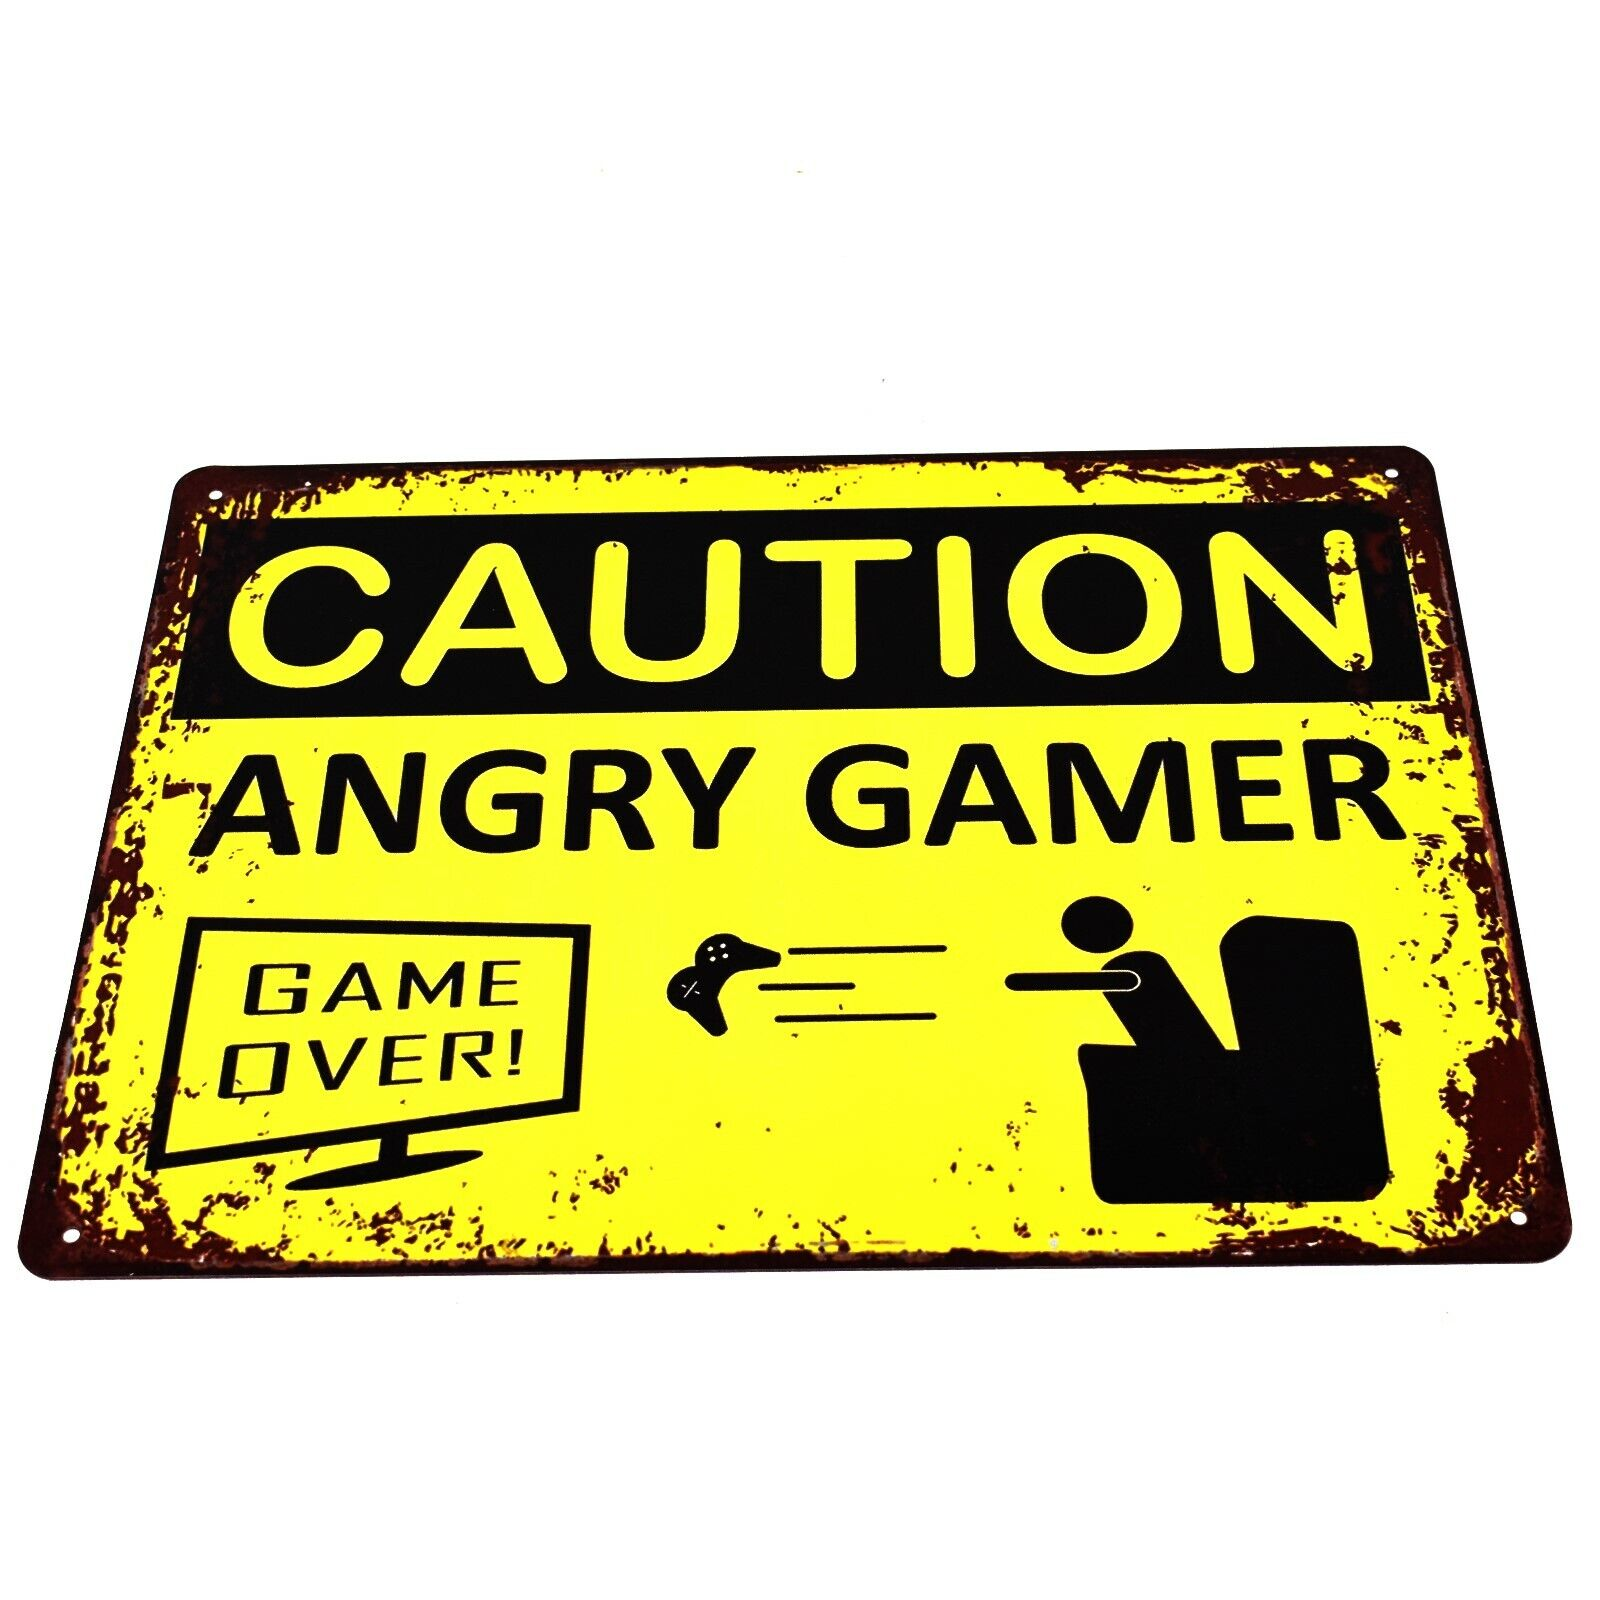 VINTAGE ADVERTISING ENAMEL METAL TIN SIGN WALL PLAQUE Warning Angry Gamer